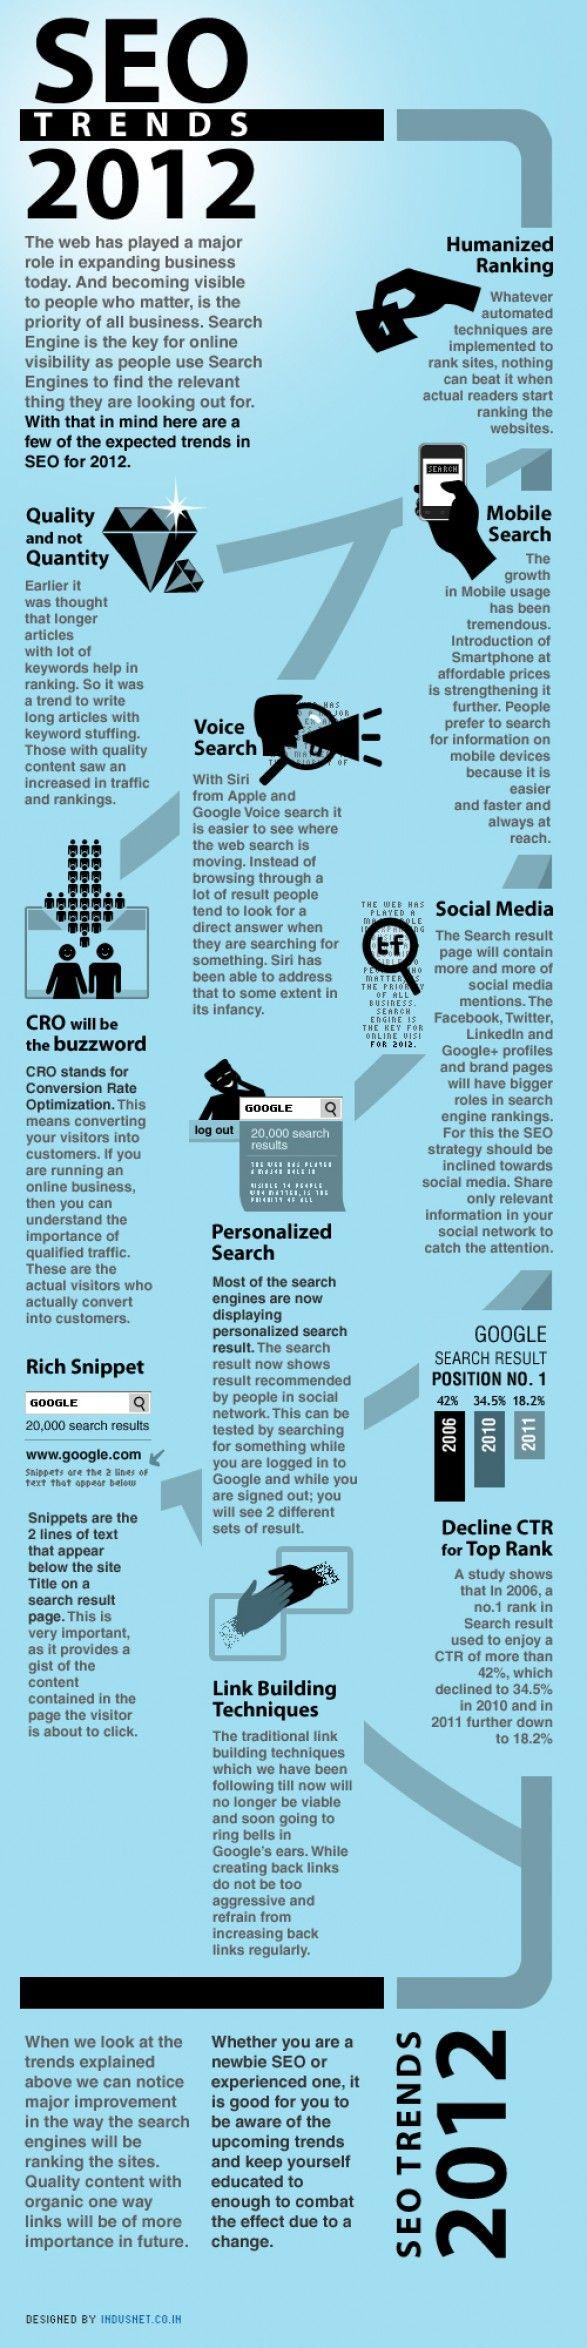 #SEO Trends 2012